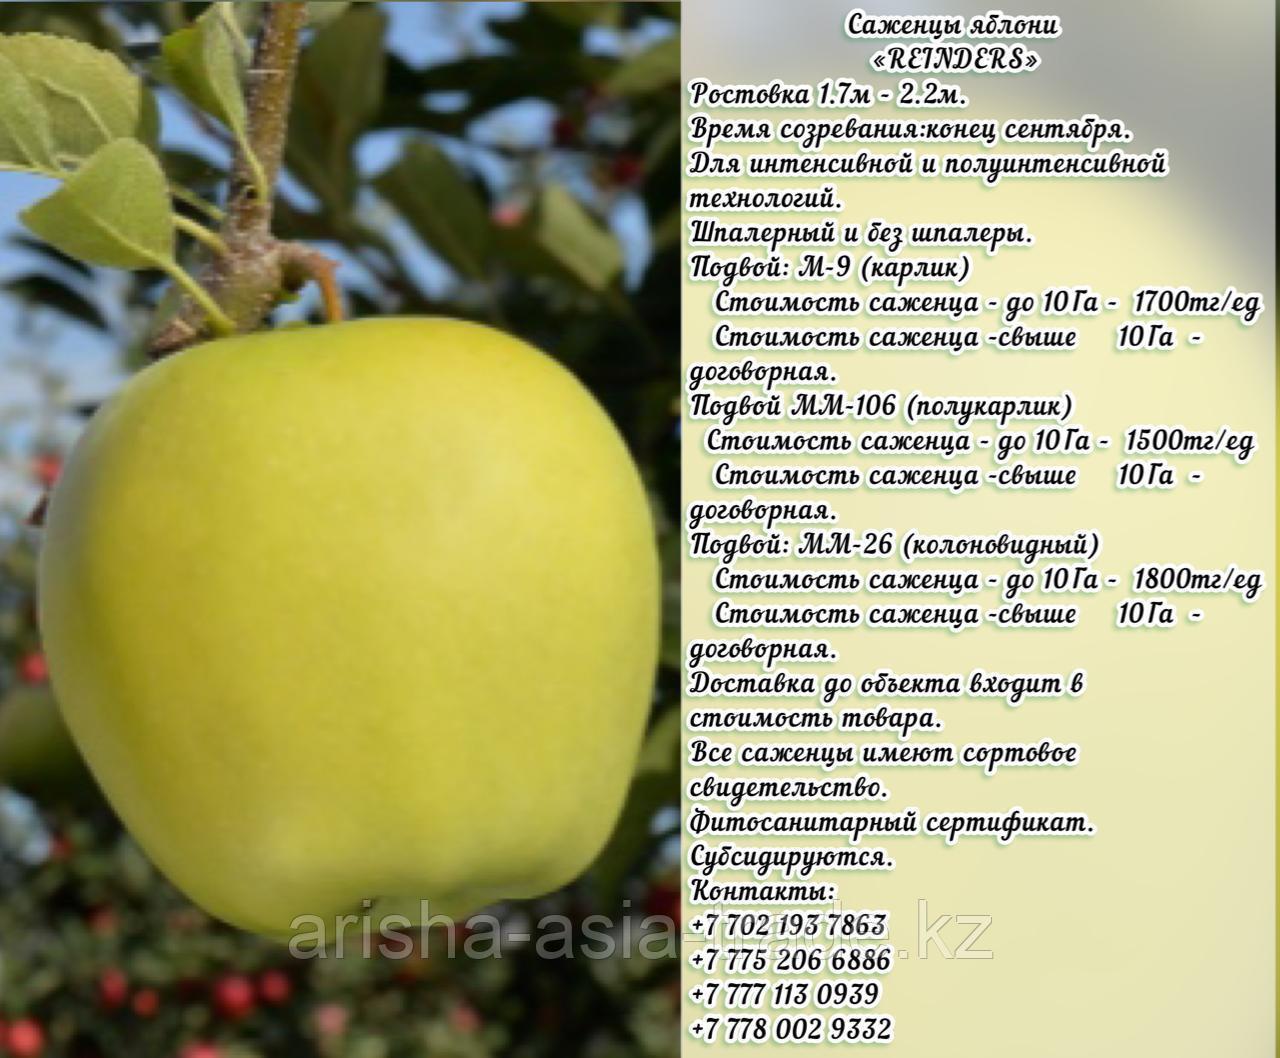 "Саженцы яблони ""Rainders"" (Рэндэрс) М 9 Сербия"